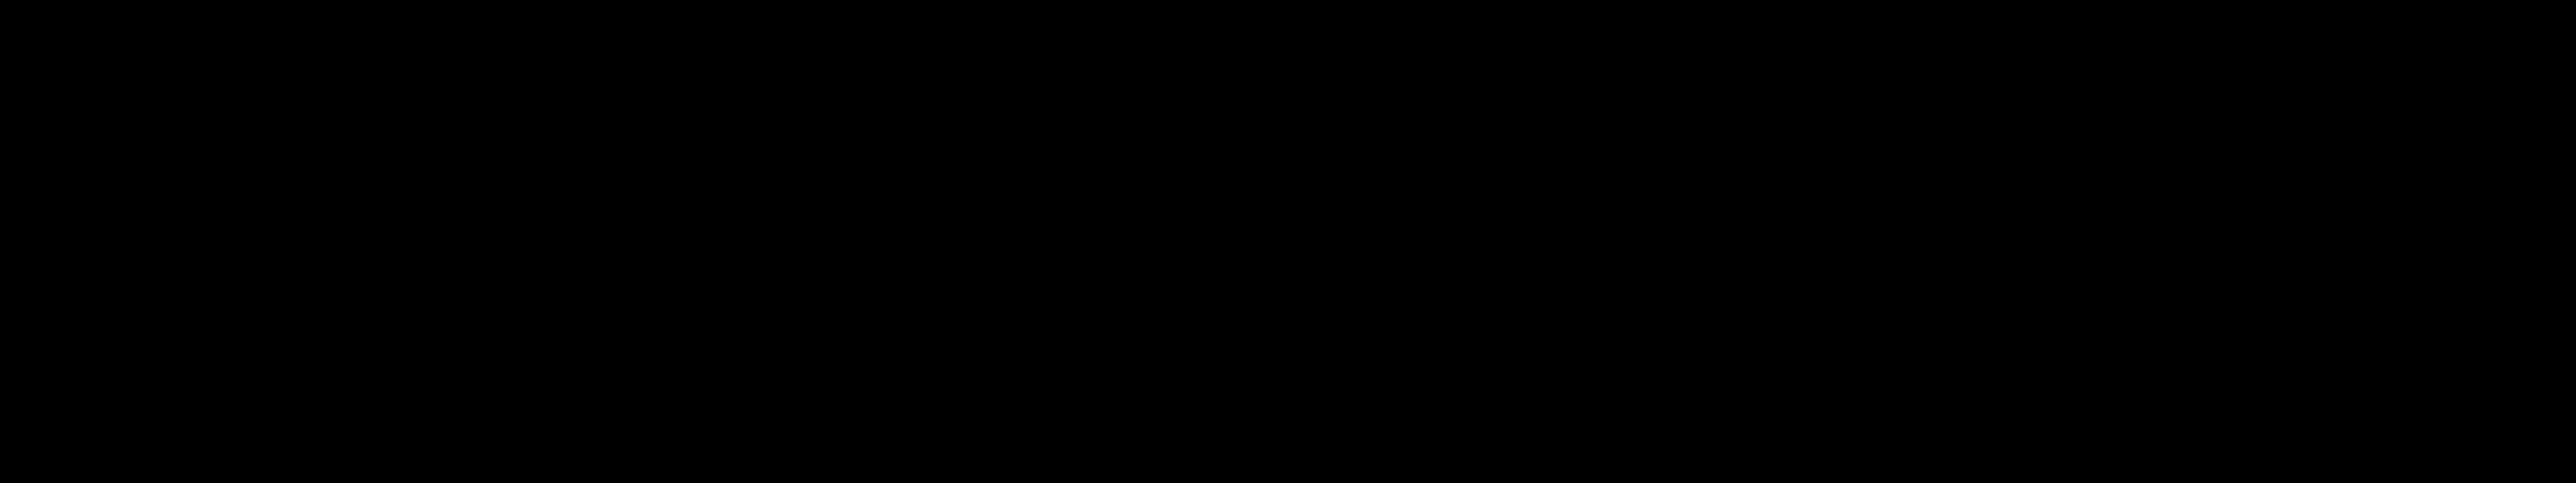 logo-sociales-teseo-negro